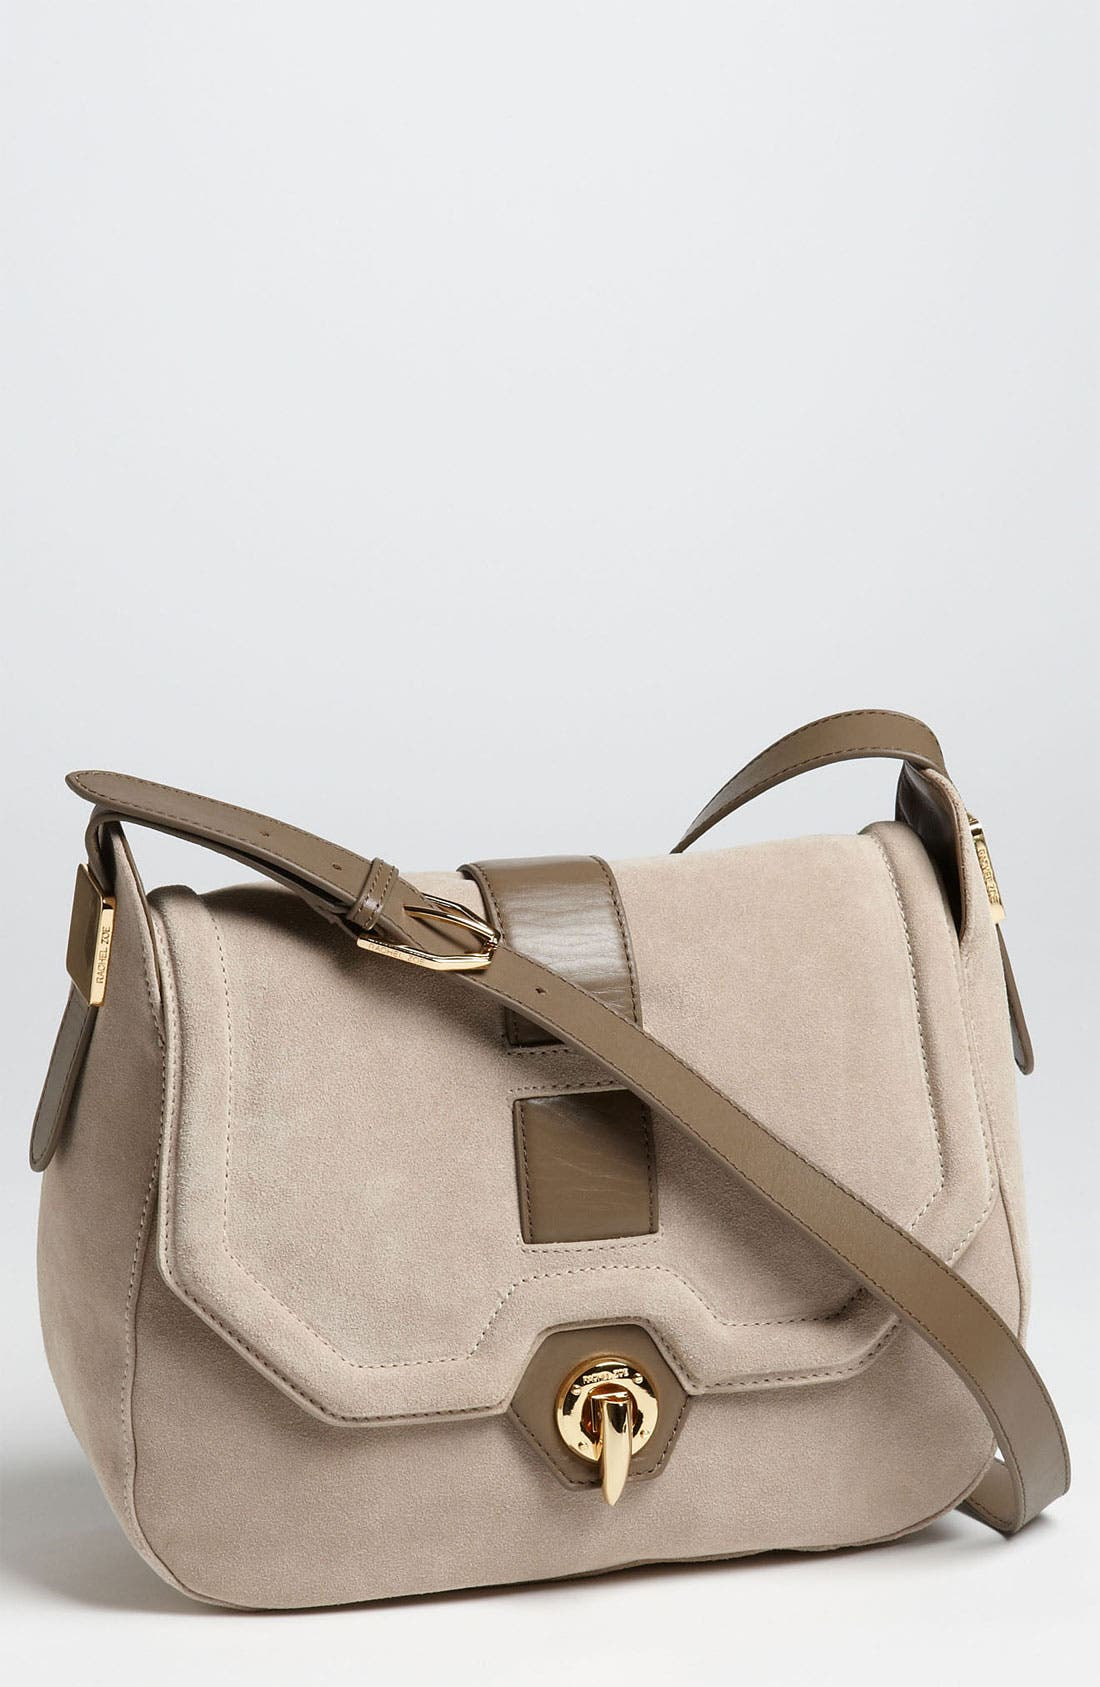 Main Image - Rachel Zoe 'Eve - Large' Crossbody Bag